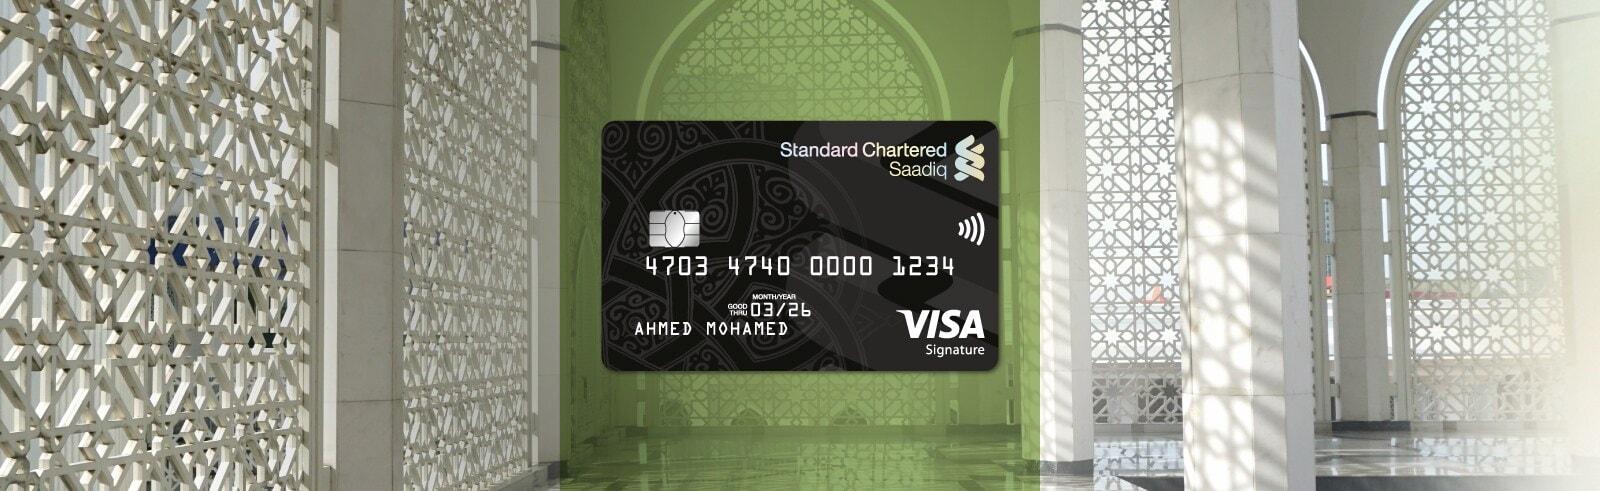 Saadiq platinum card UAE